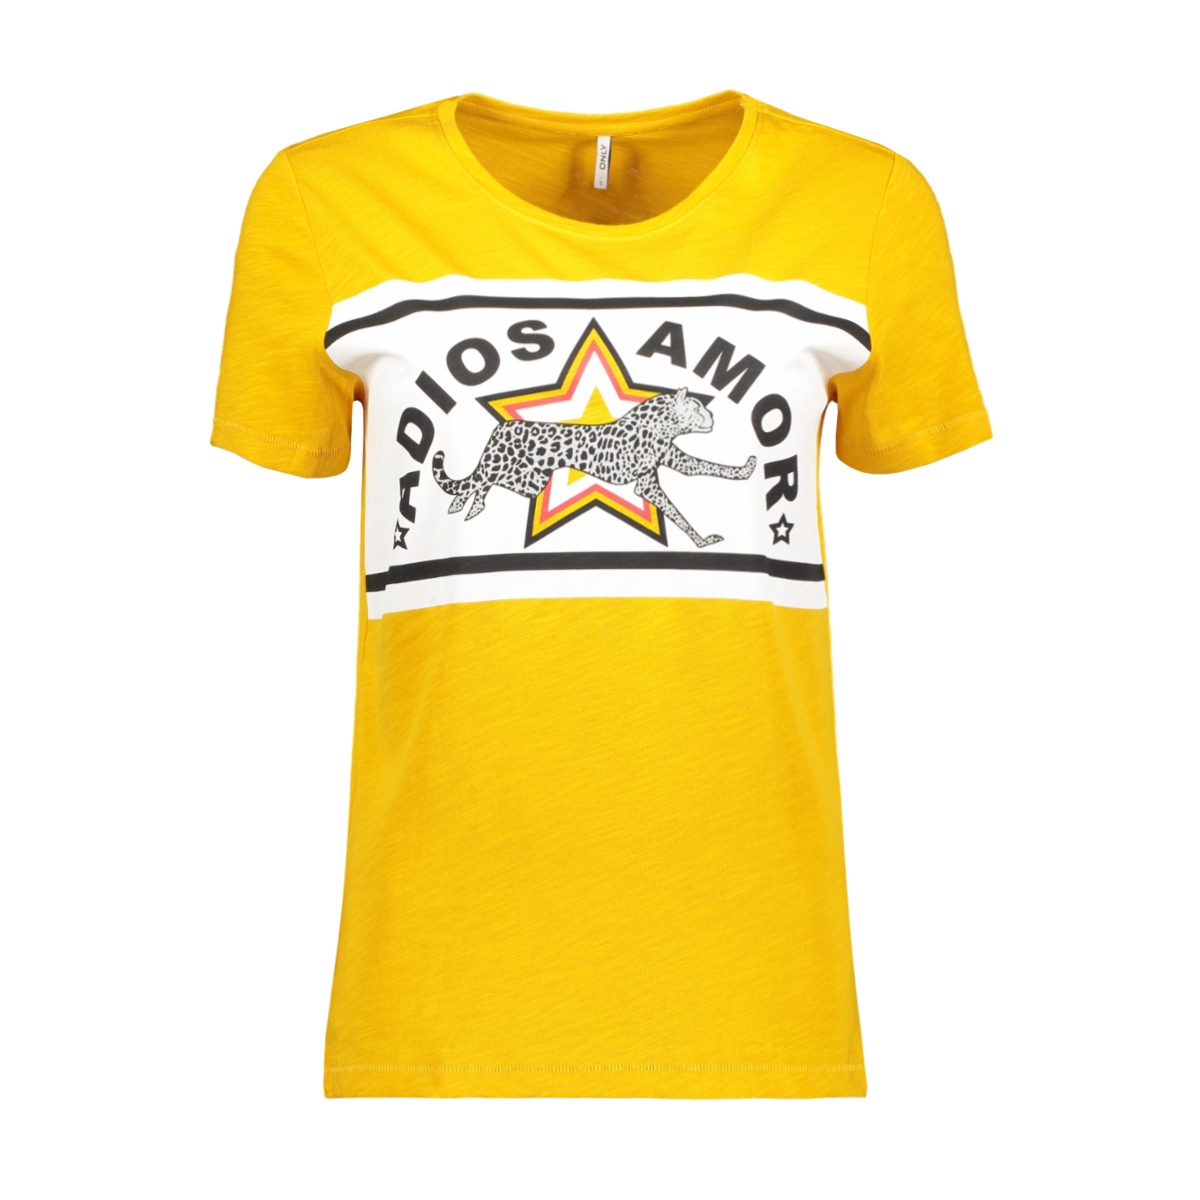 onladios s/s top jrs 15176585 only t-shirt mango mojito